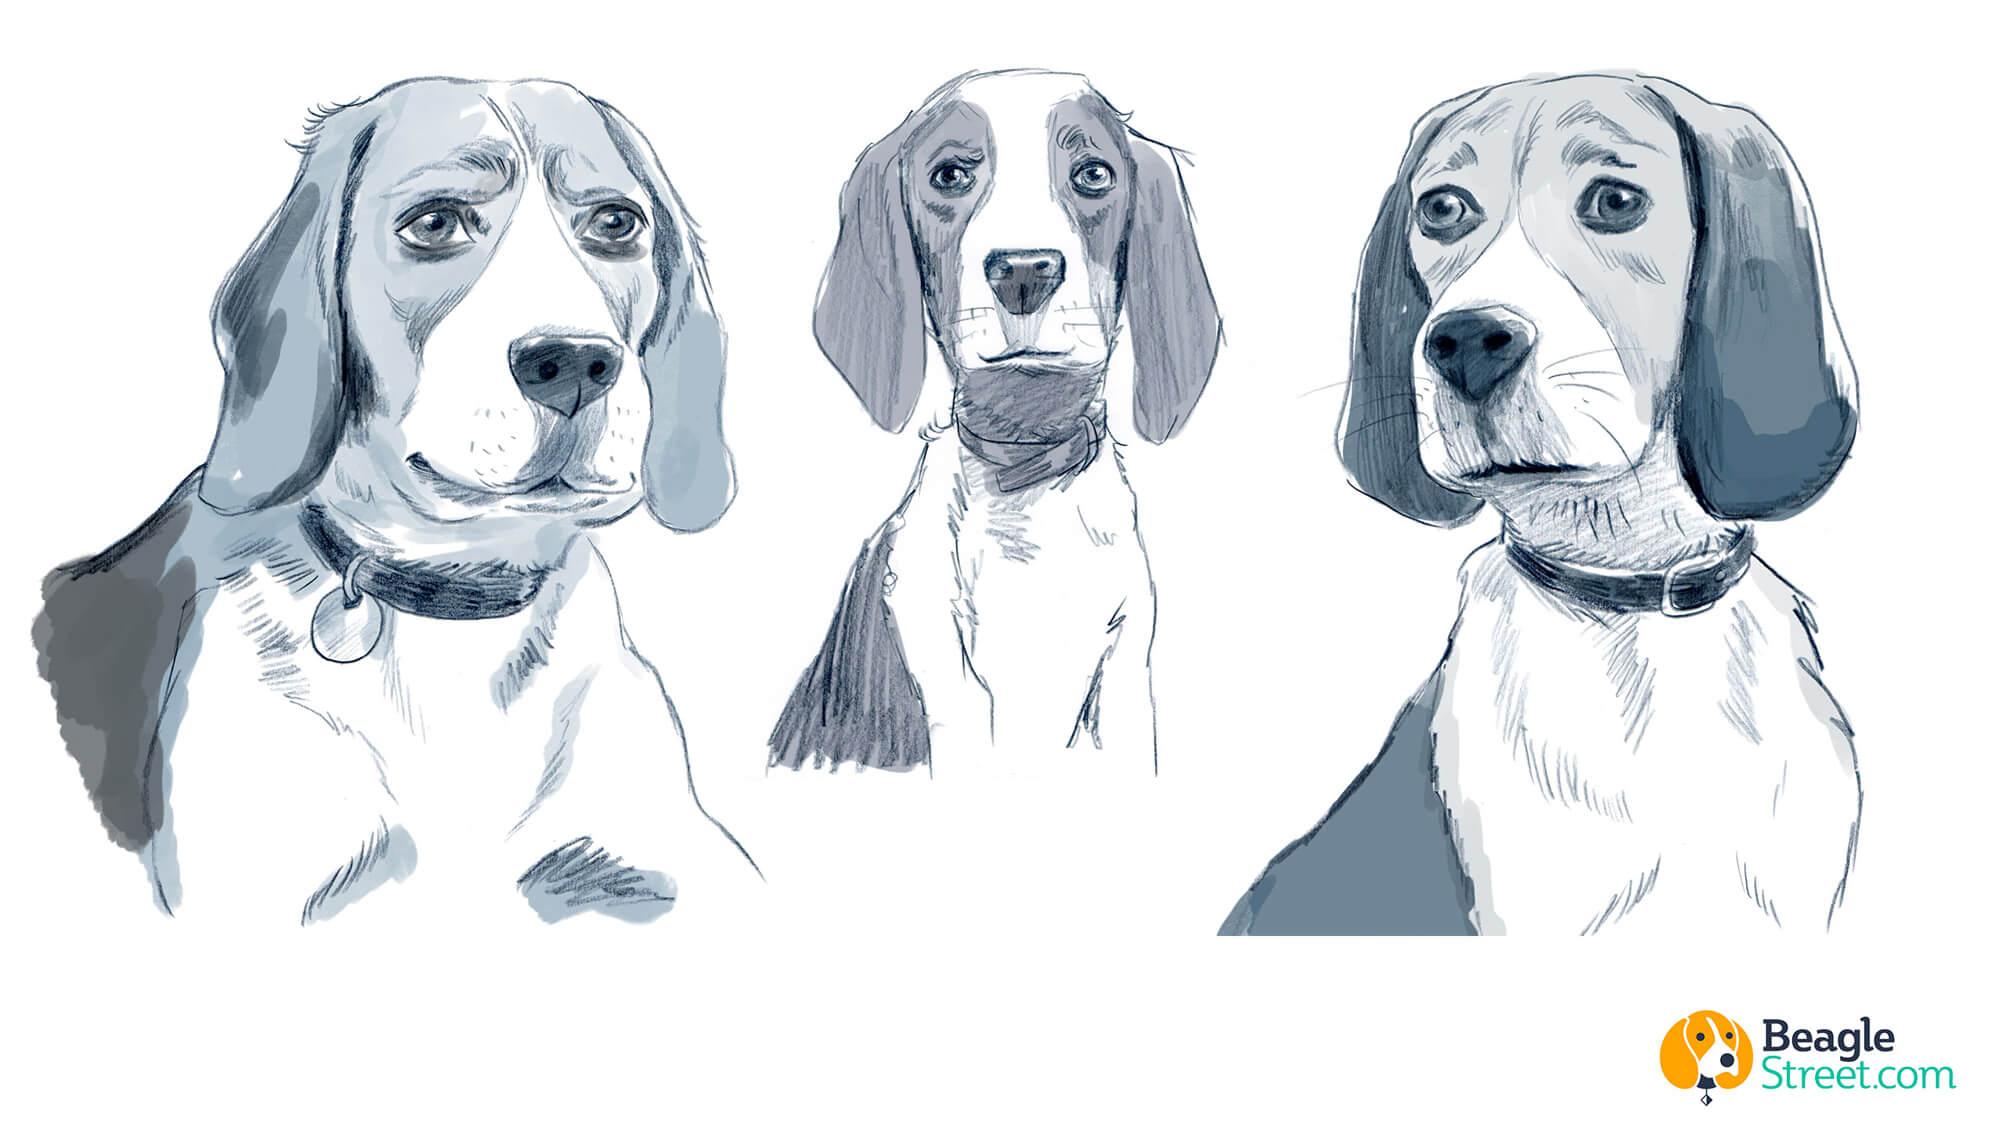 Beagle_Character_Design_4.jpg